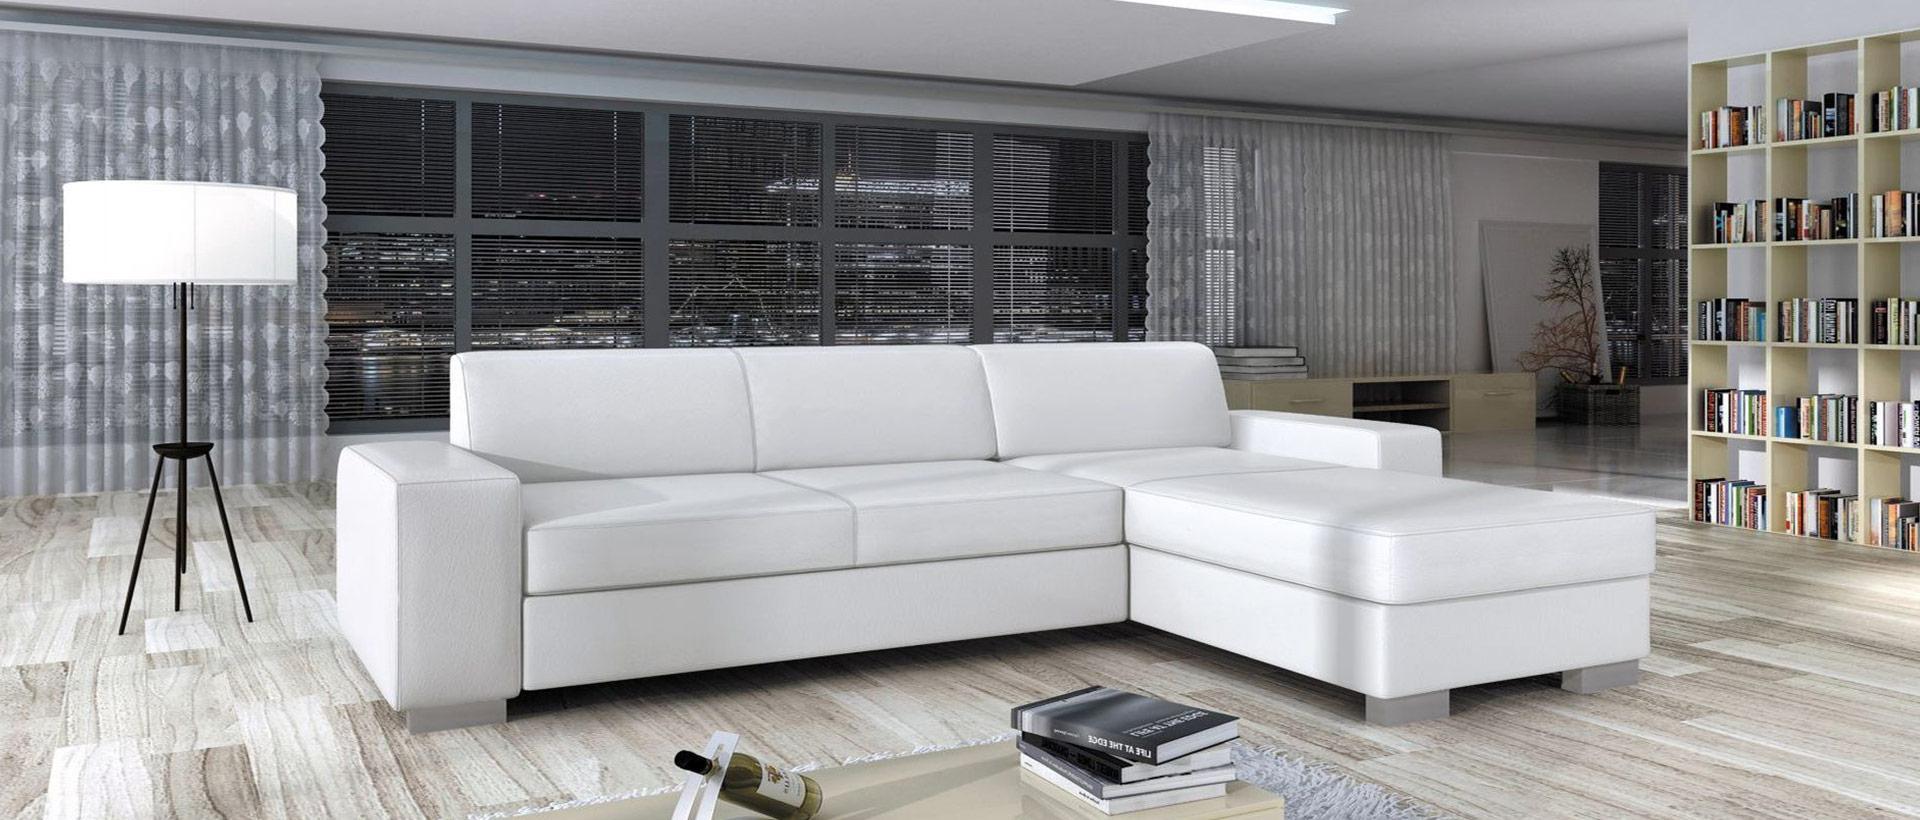 Sento sofa